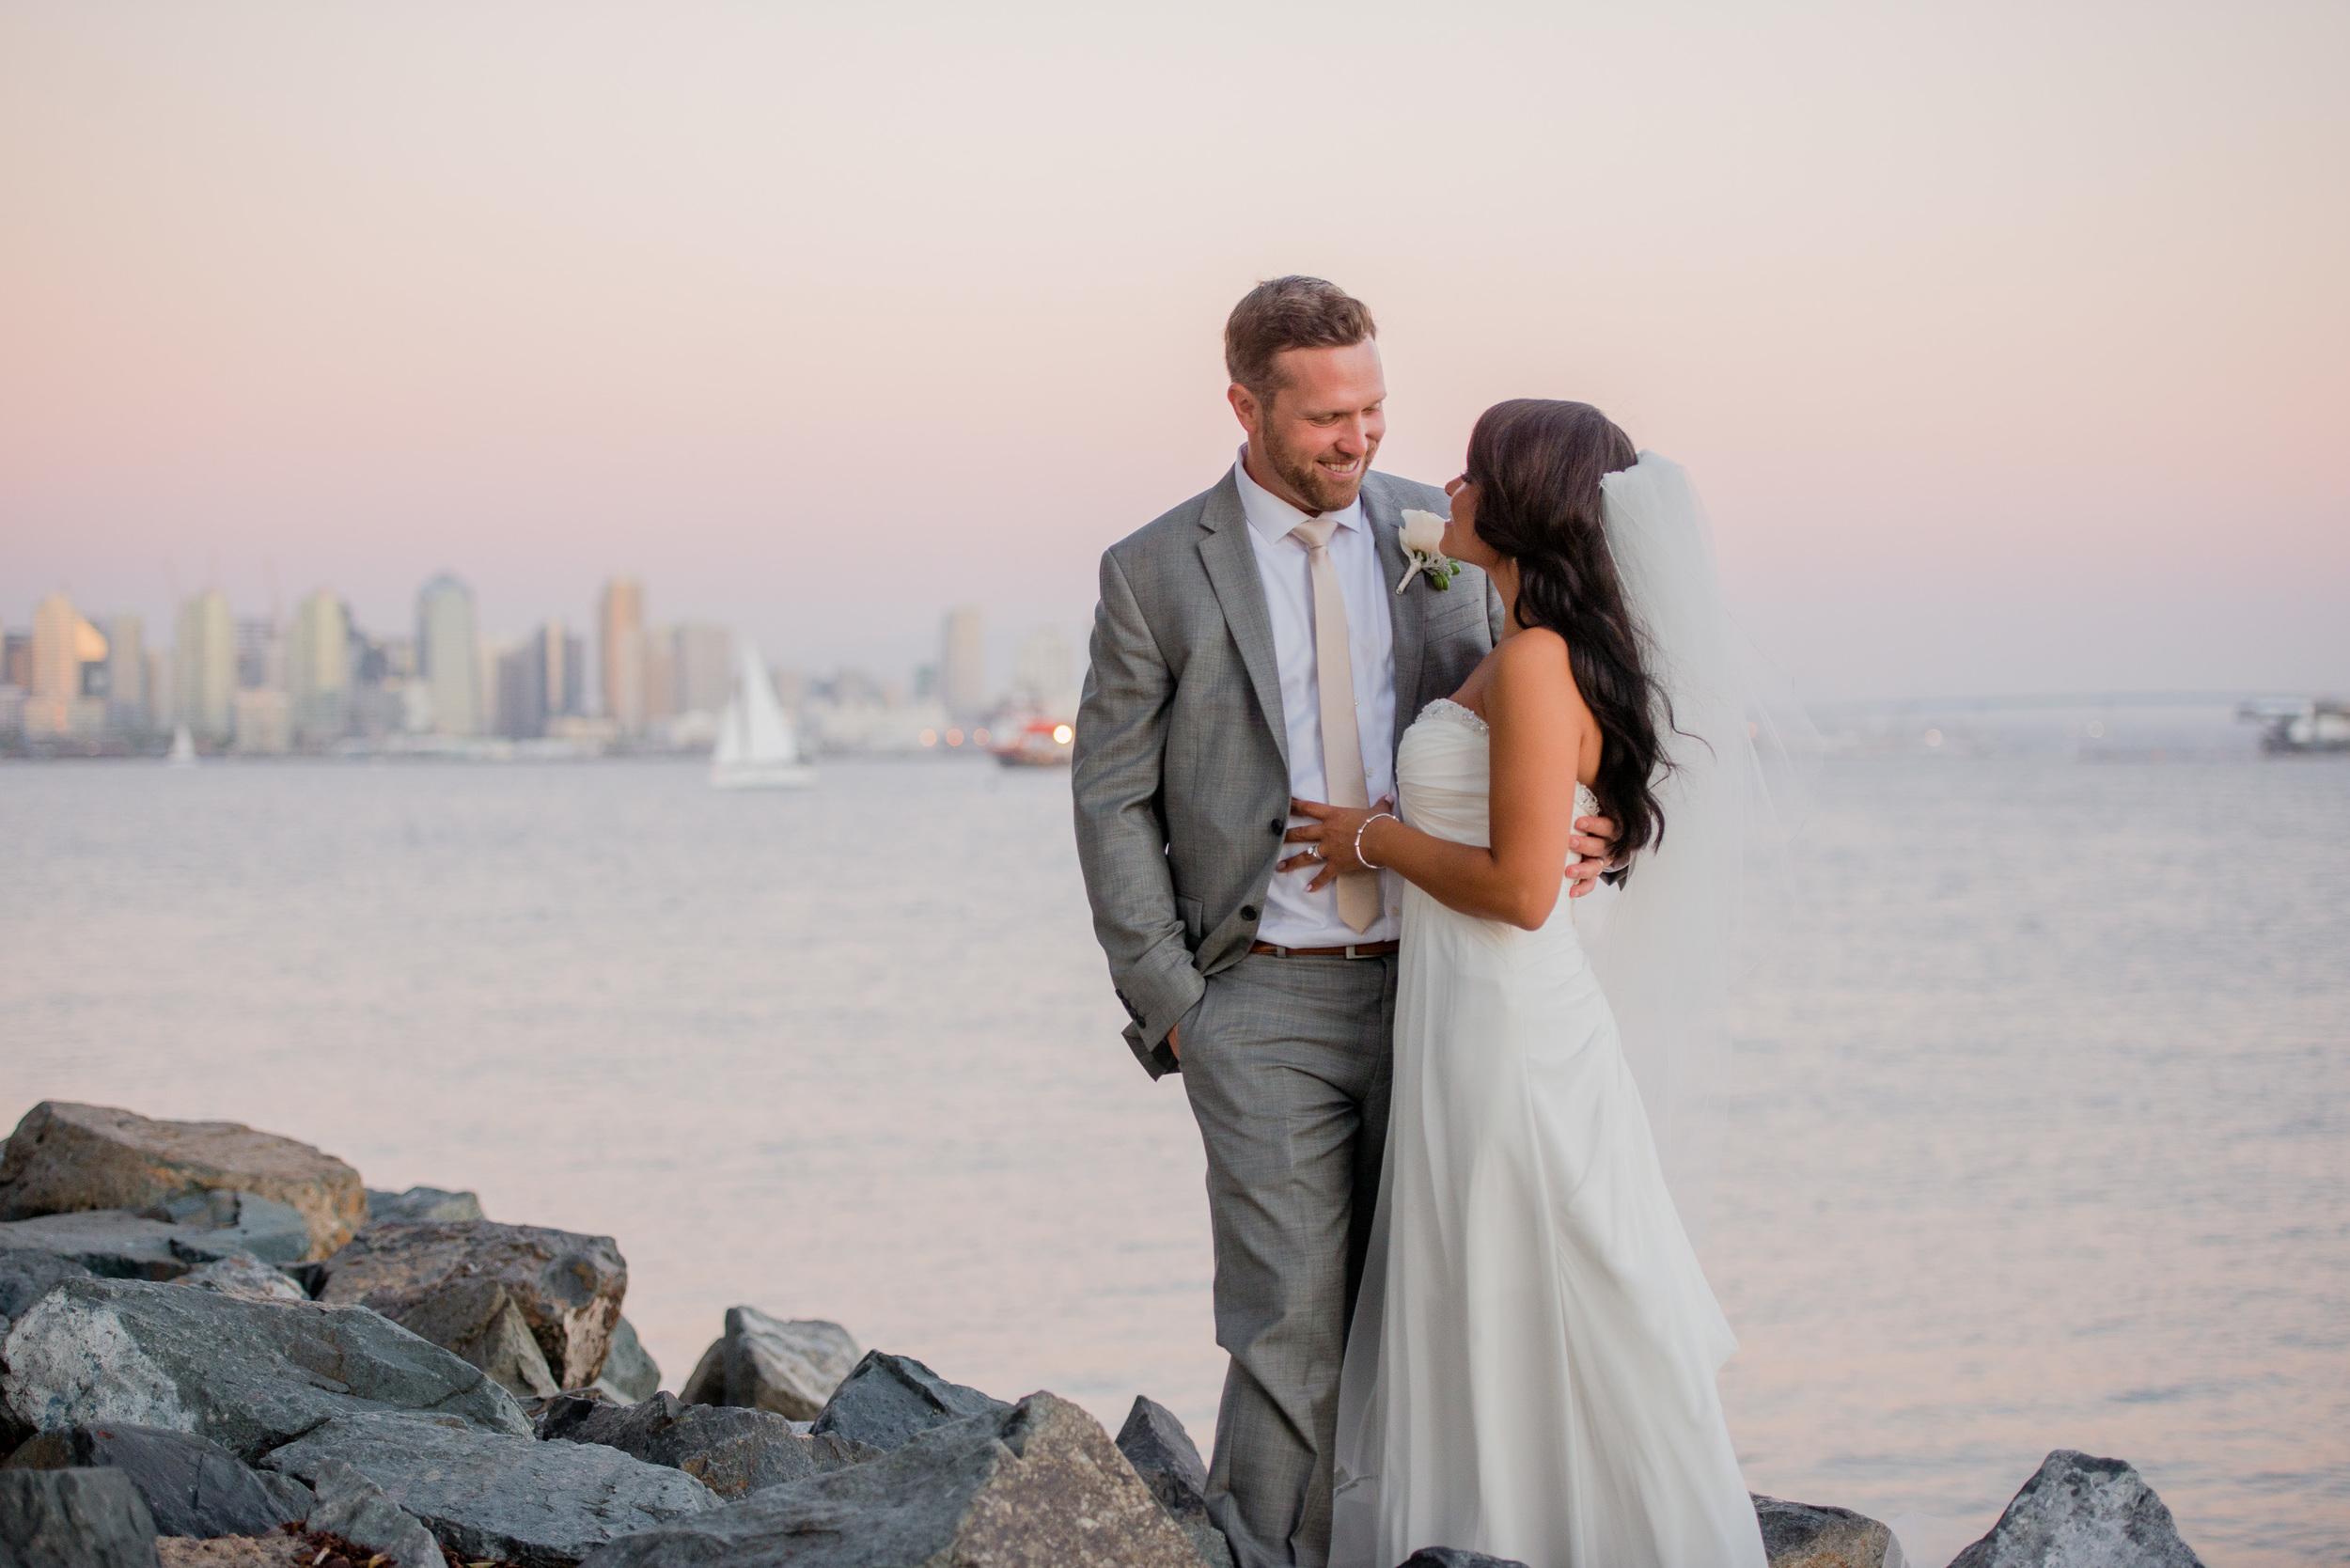 tom-hams-lighthouse-wedding-_D803186.jpg